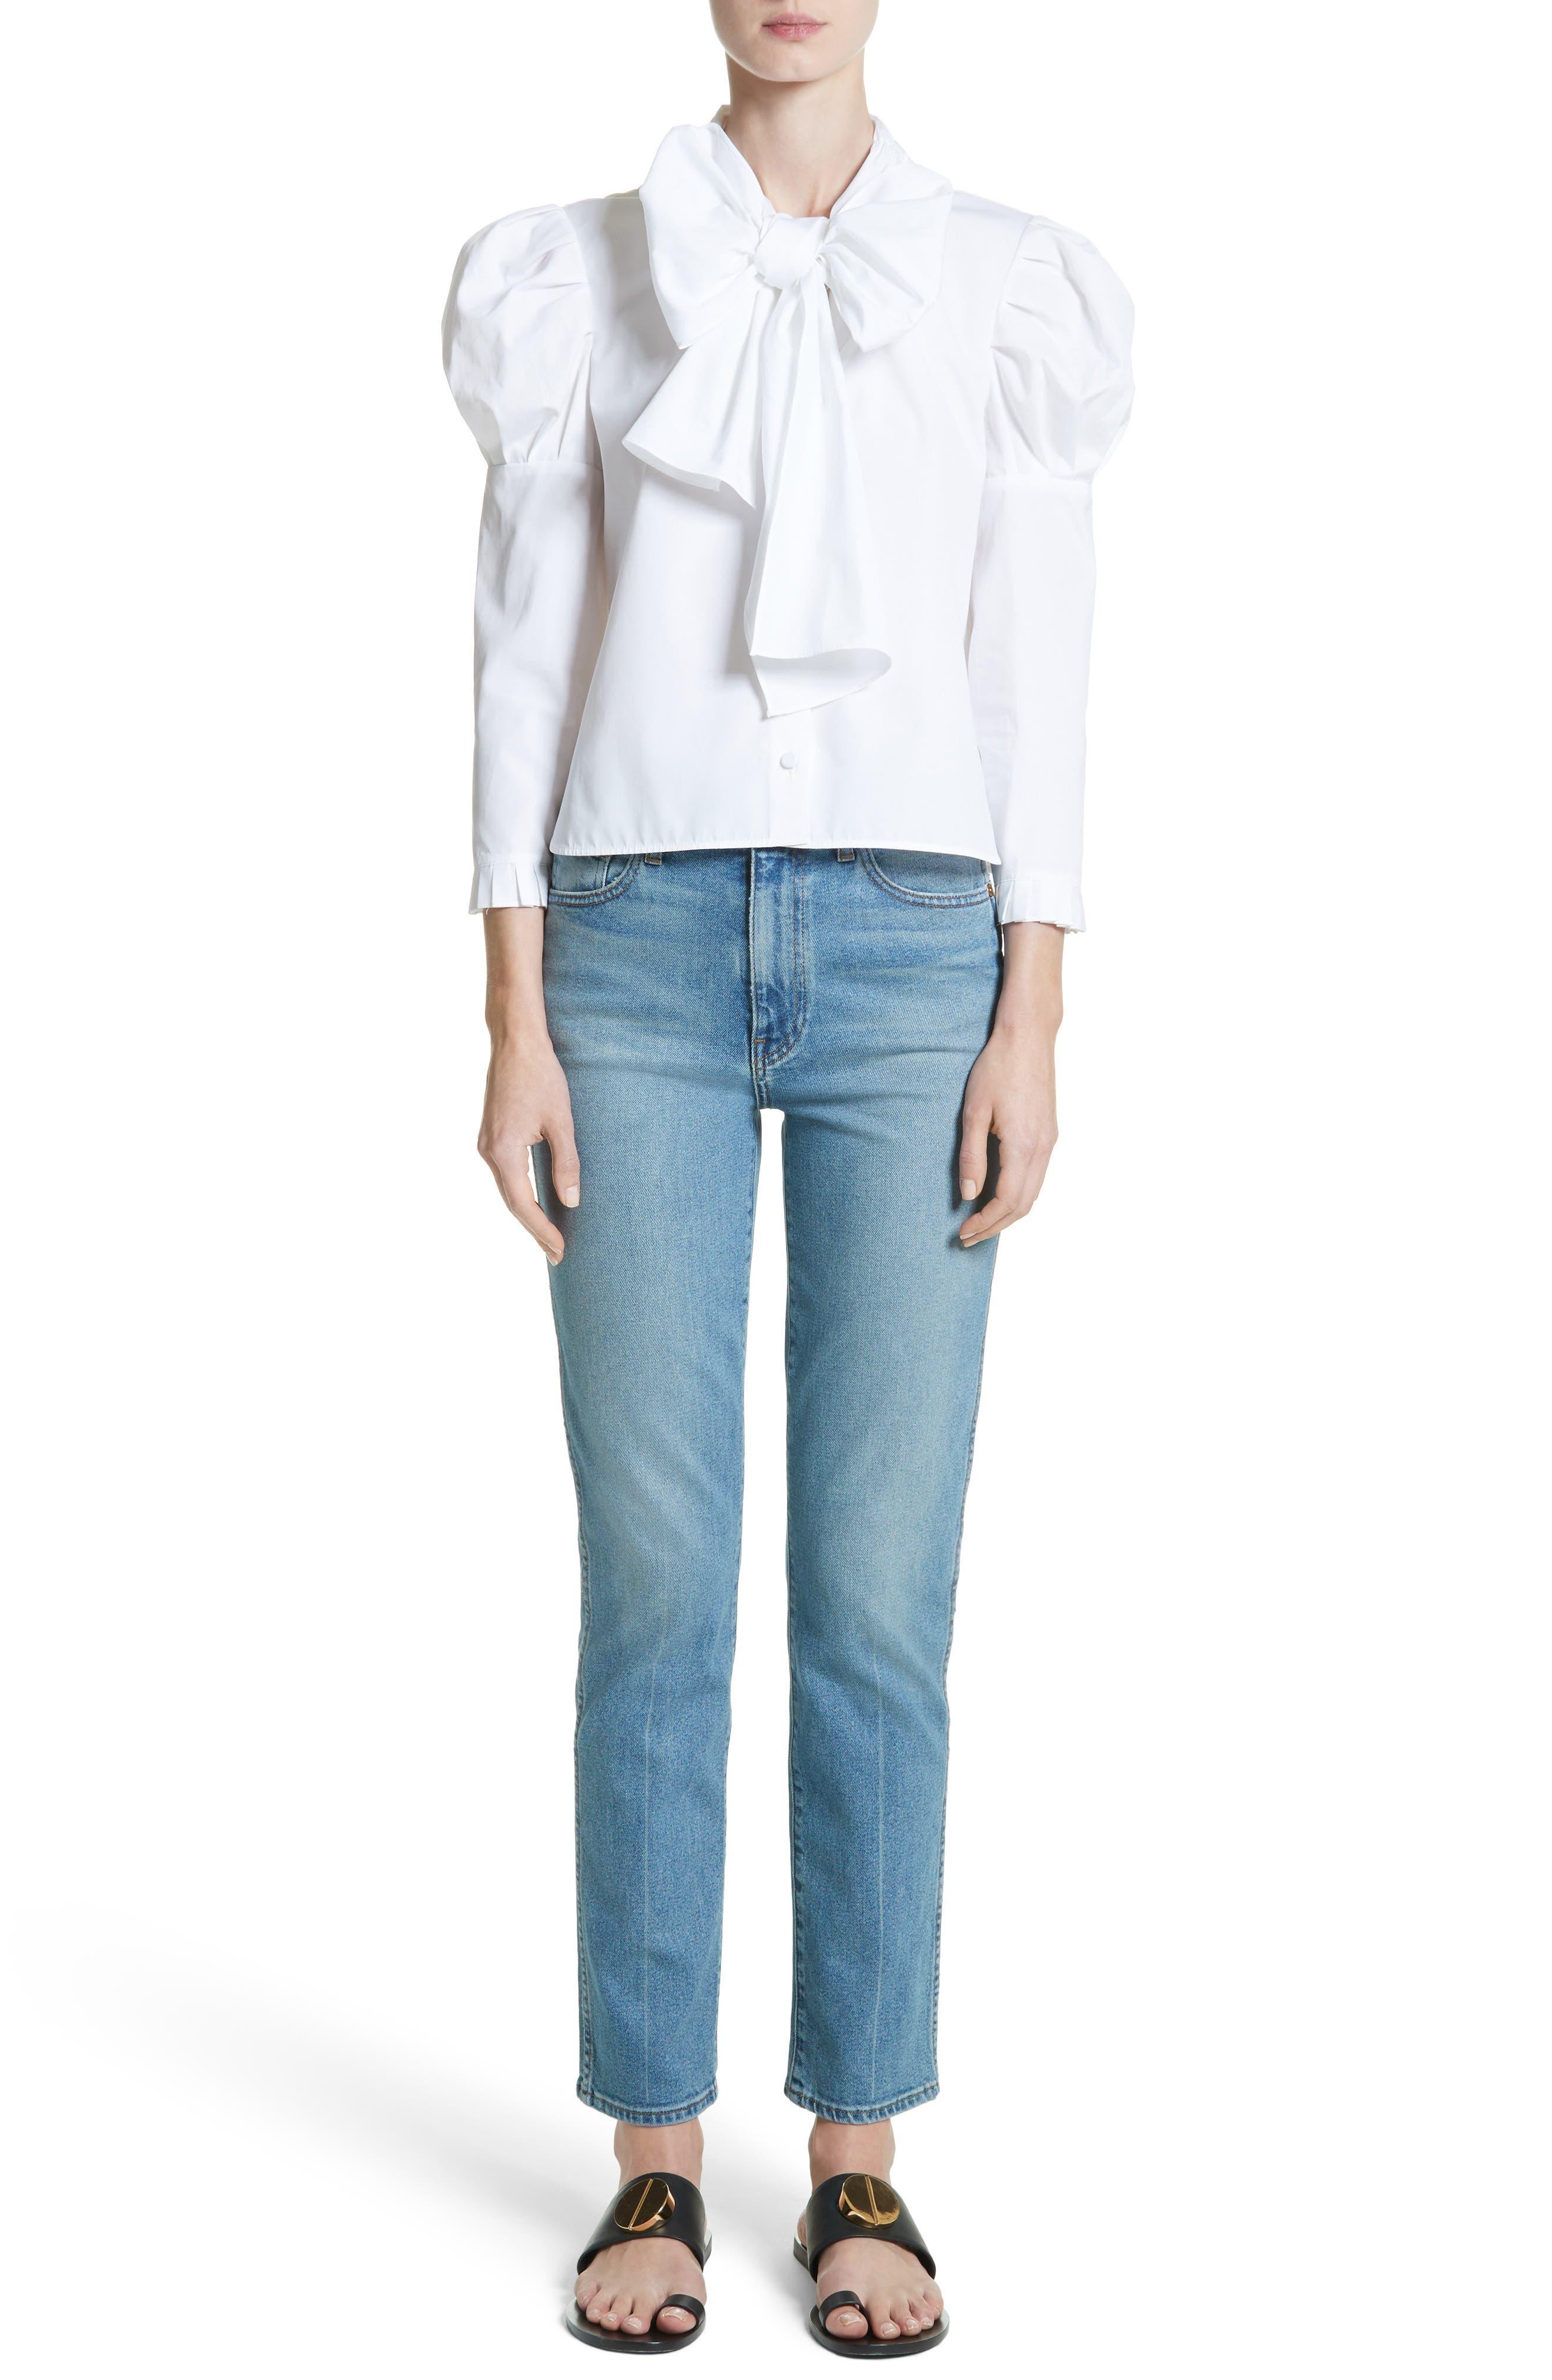 Victoria Straight Leg Jeans,                             Alternate thumbnail 8, color,                             Medium Crease